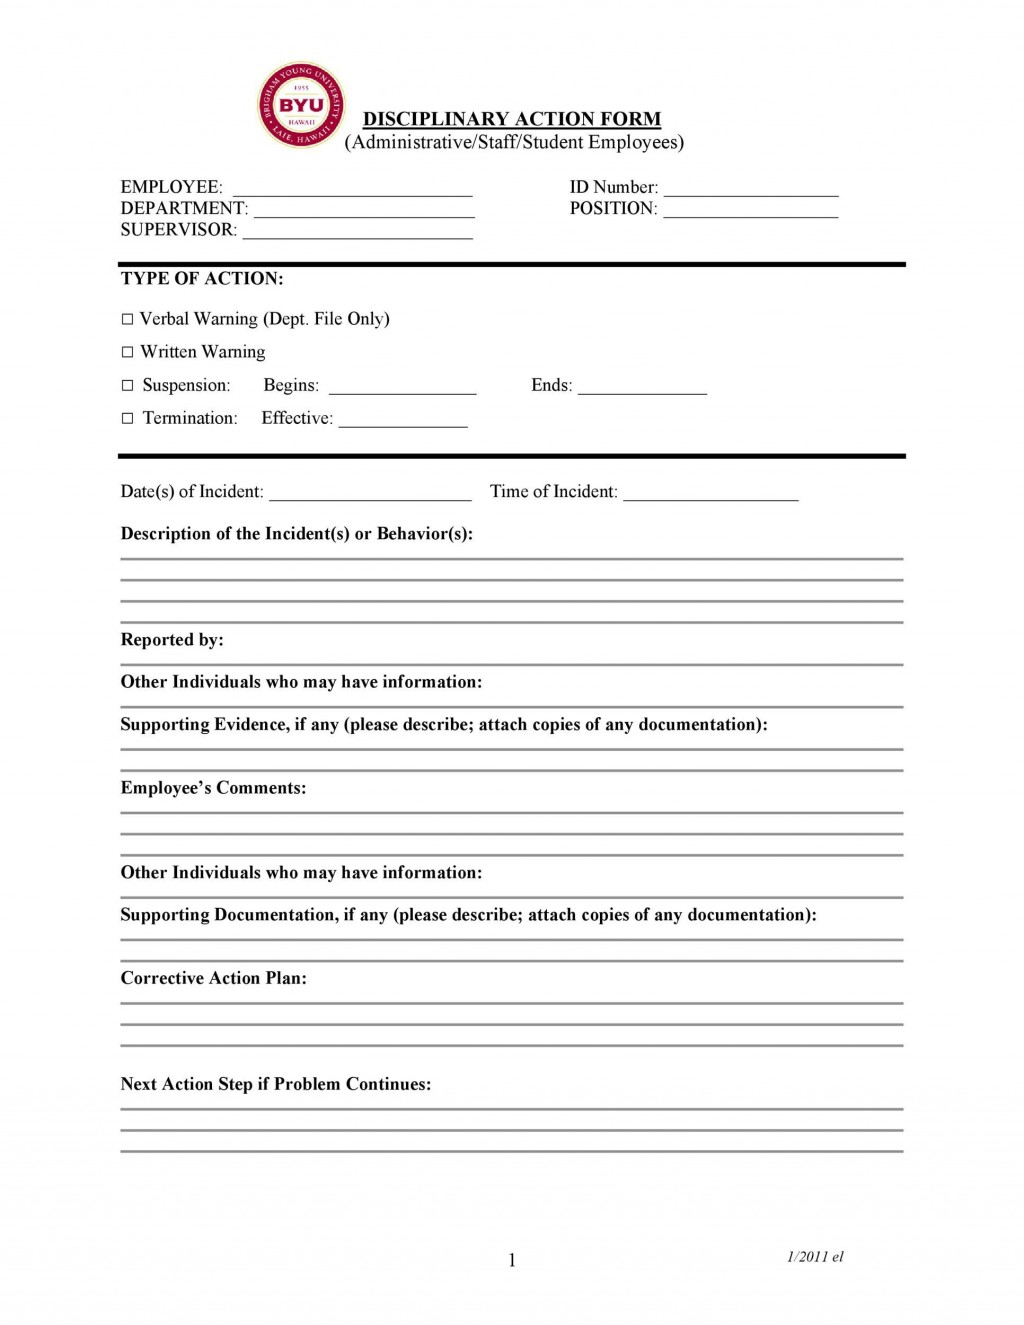 001 Astounding Employee Discipline Form Template Idea  Free Disciplinary Letter ActionLarge